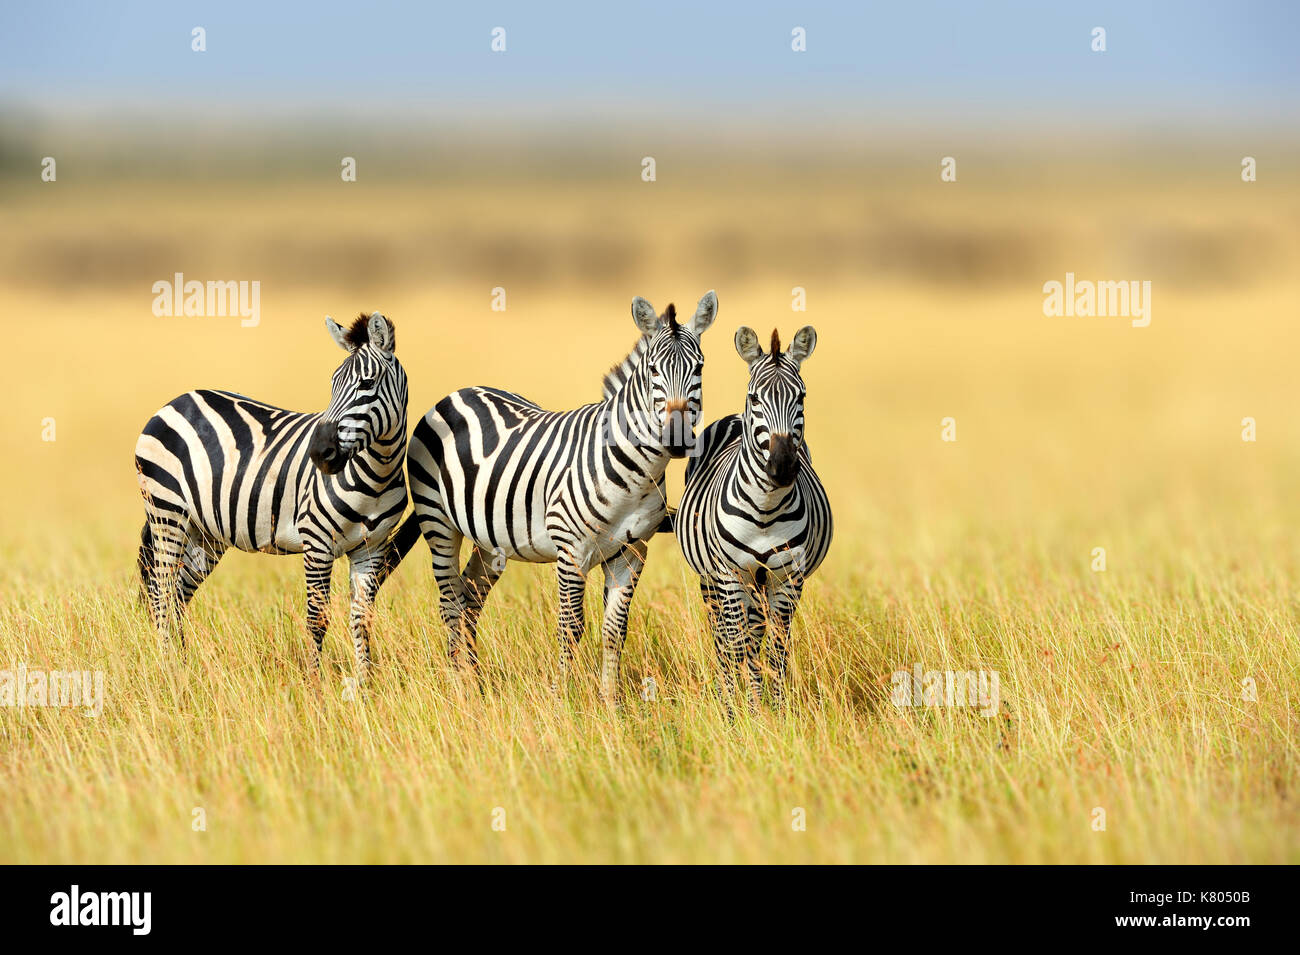 Zebra in the grass nature habitat, National Park of Kenya. Wildlife scene from nature, Africa - Stock Image